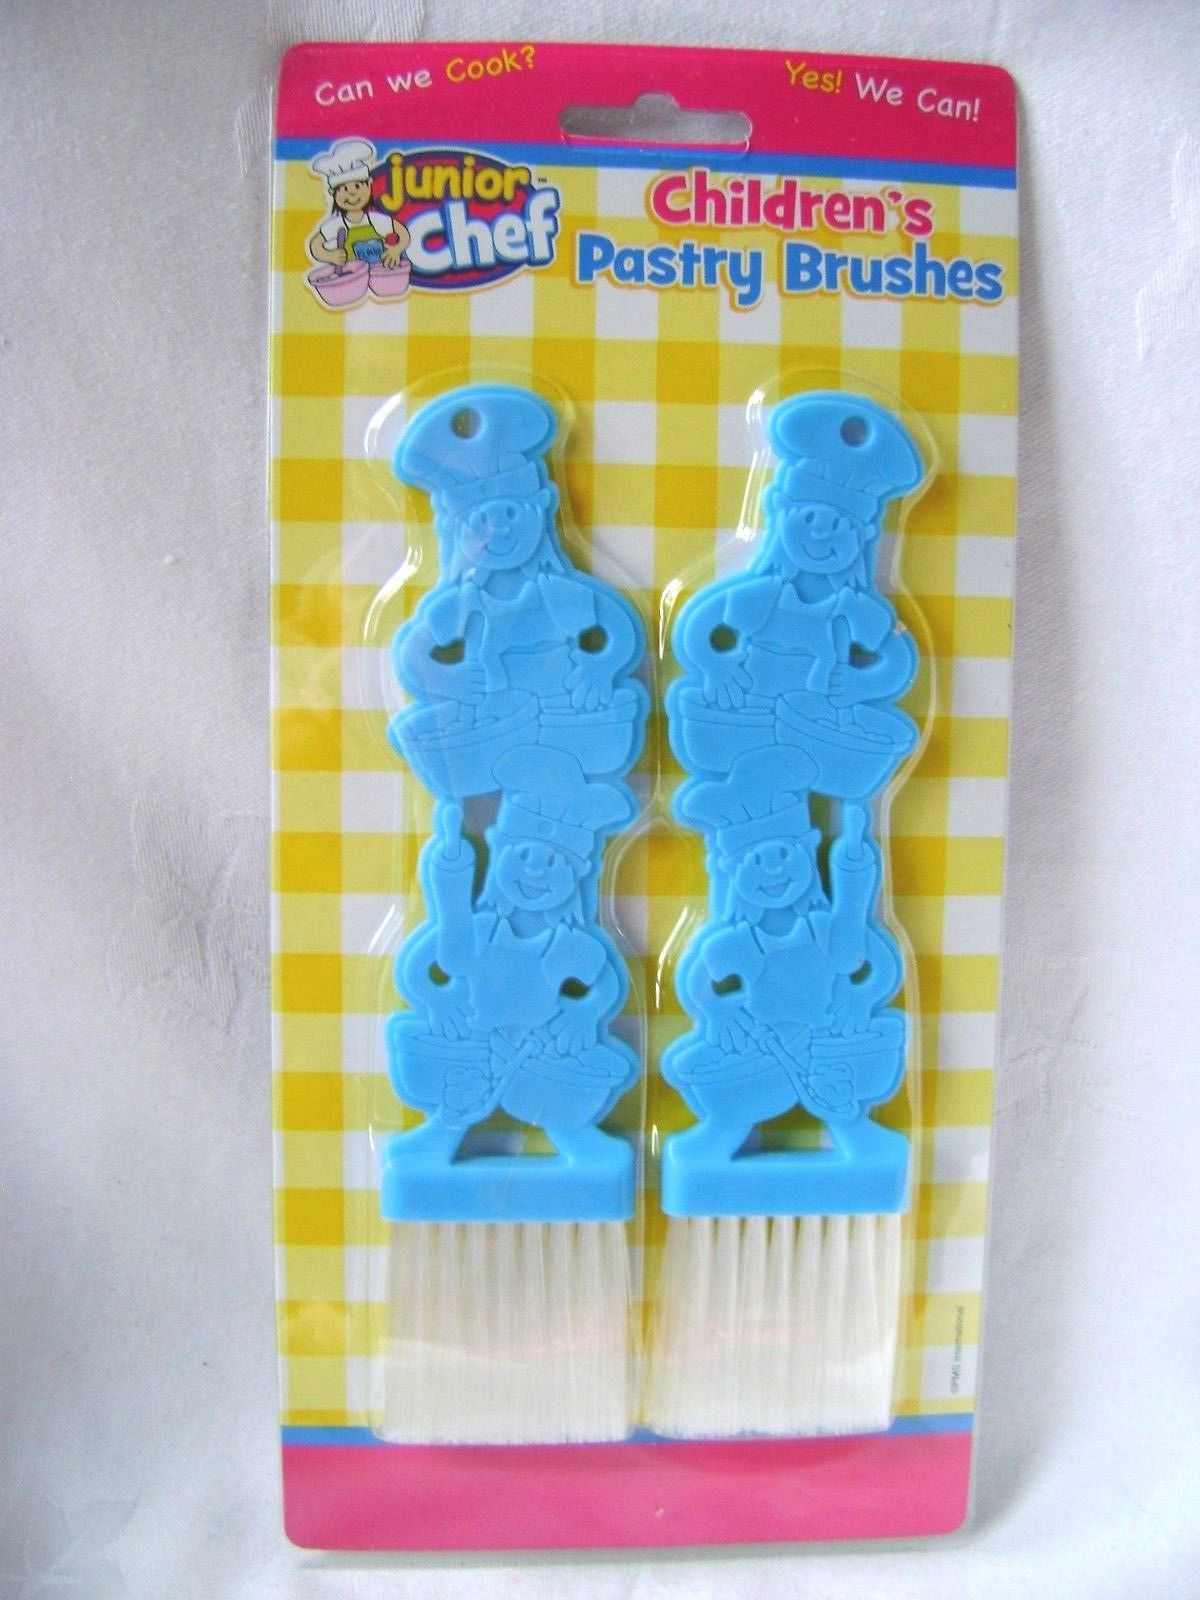 NEU-2er-Set-Kinder-Geback-Backen-Pinsel-Chef-Design-blau-oder-rosa-PMS-Verkauf